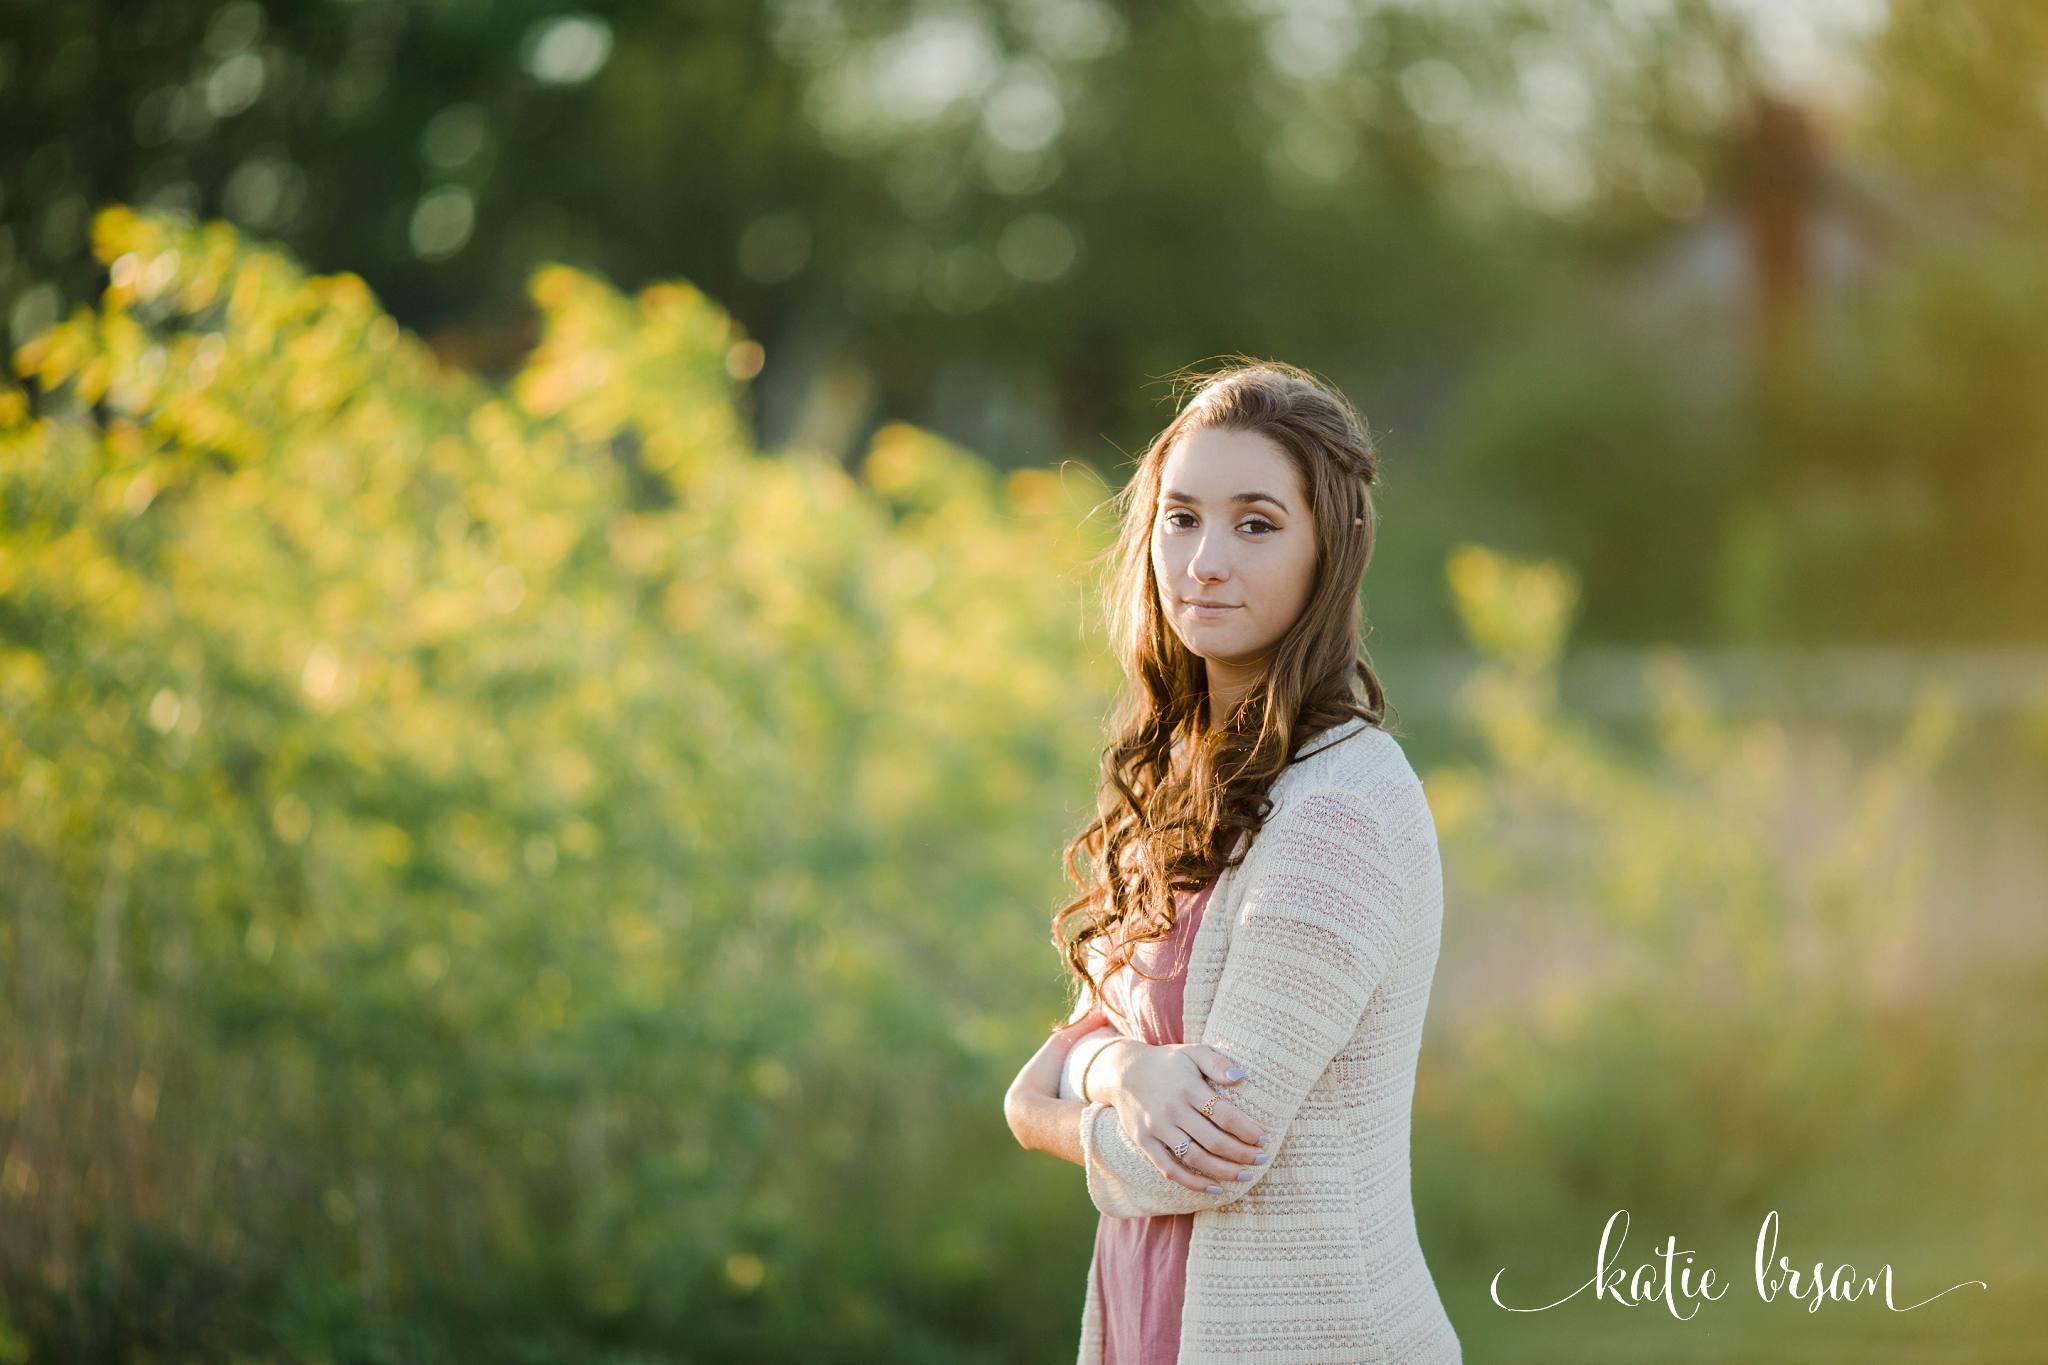 KatieBrsan-Frantfort-seniorphotographer_0543.jpg